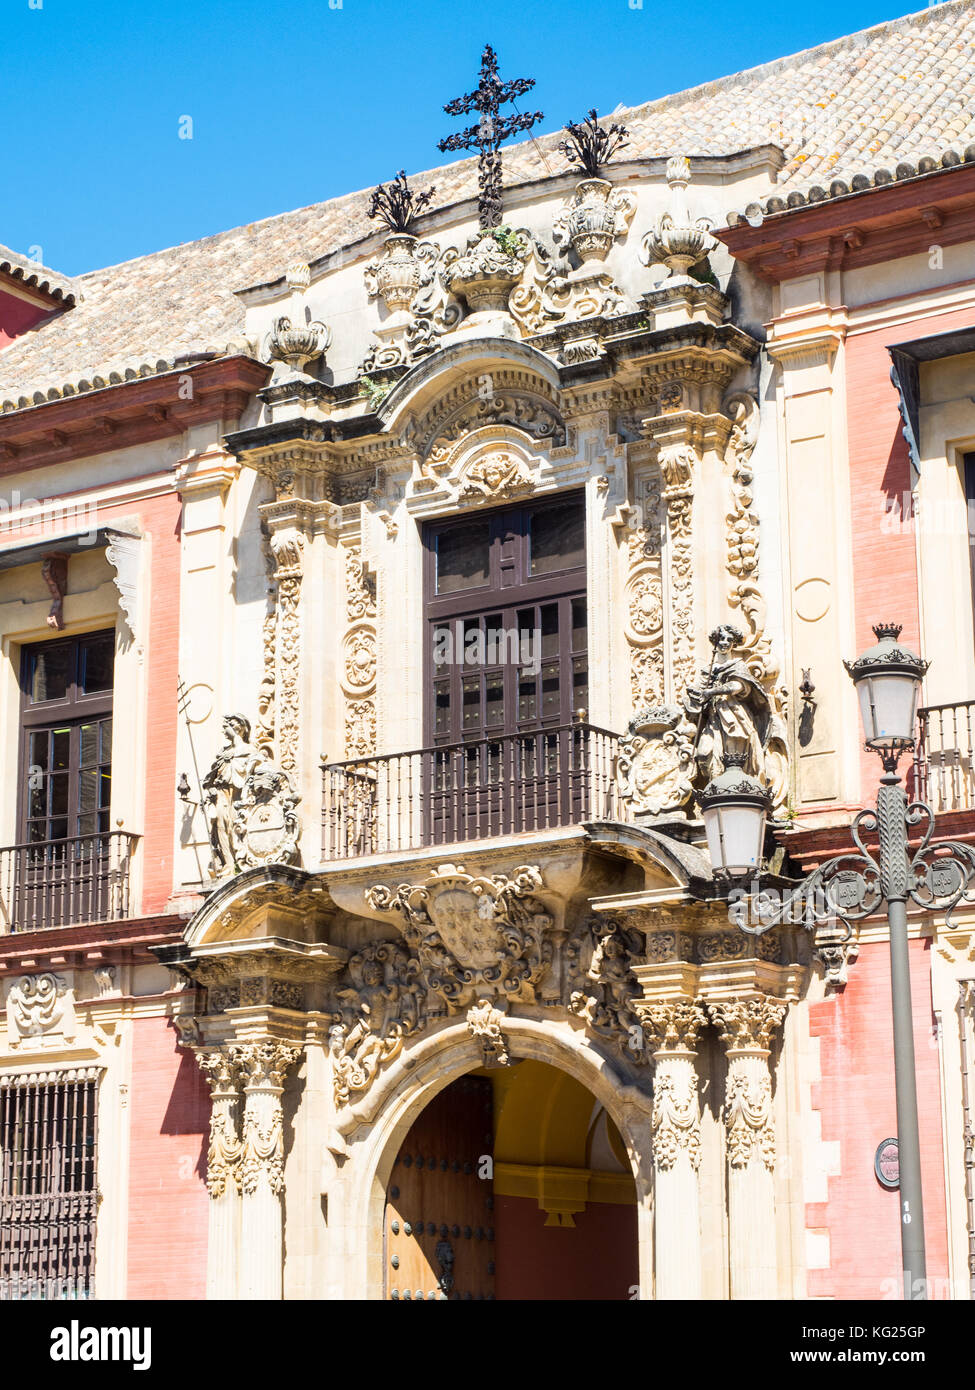 Archbishop's Palace, Seville (Sevilla), Andalucia, Spain, Europe - Stock Image